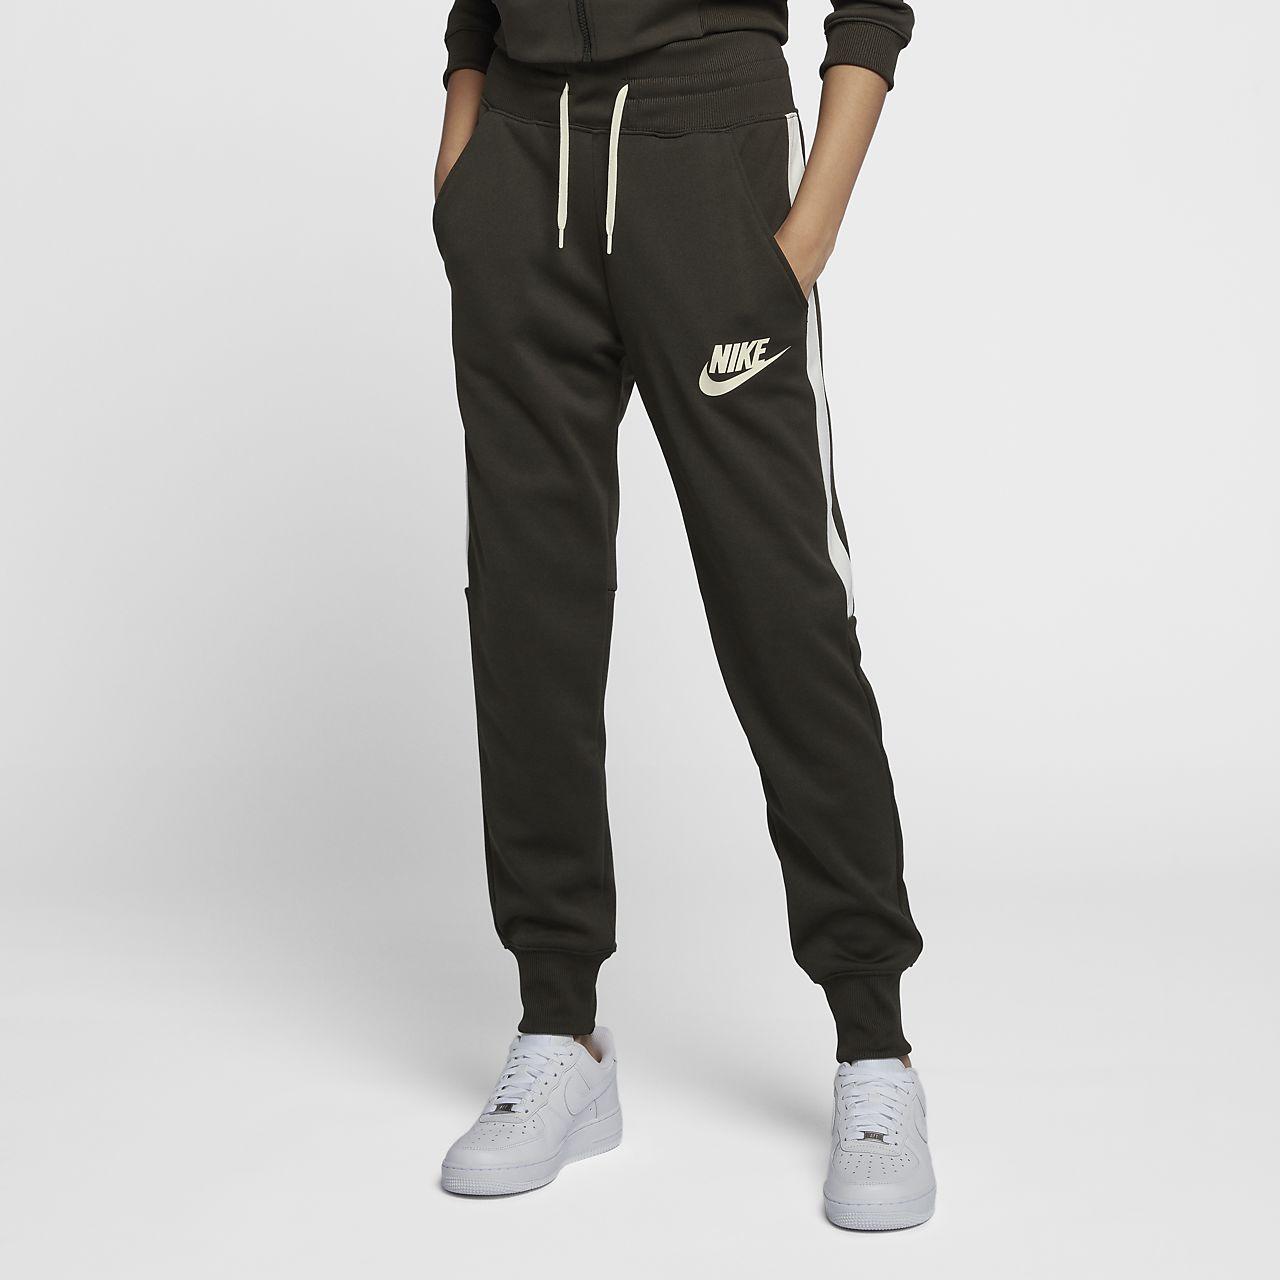 Nike Grey Joggers Womens